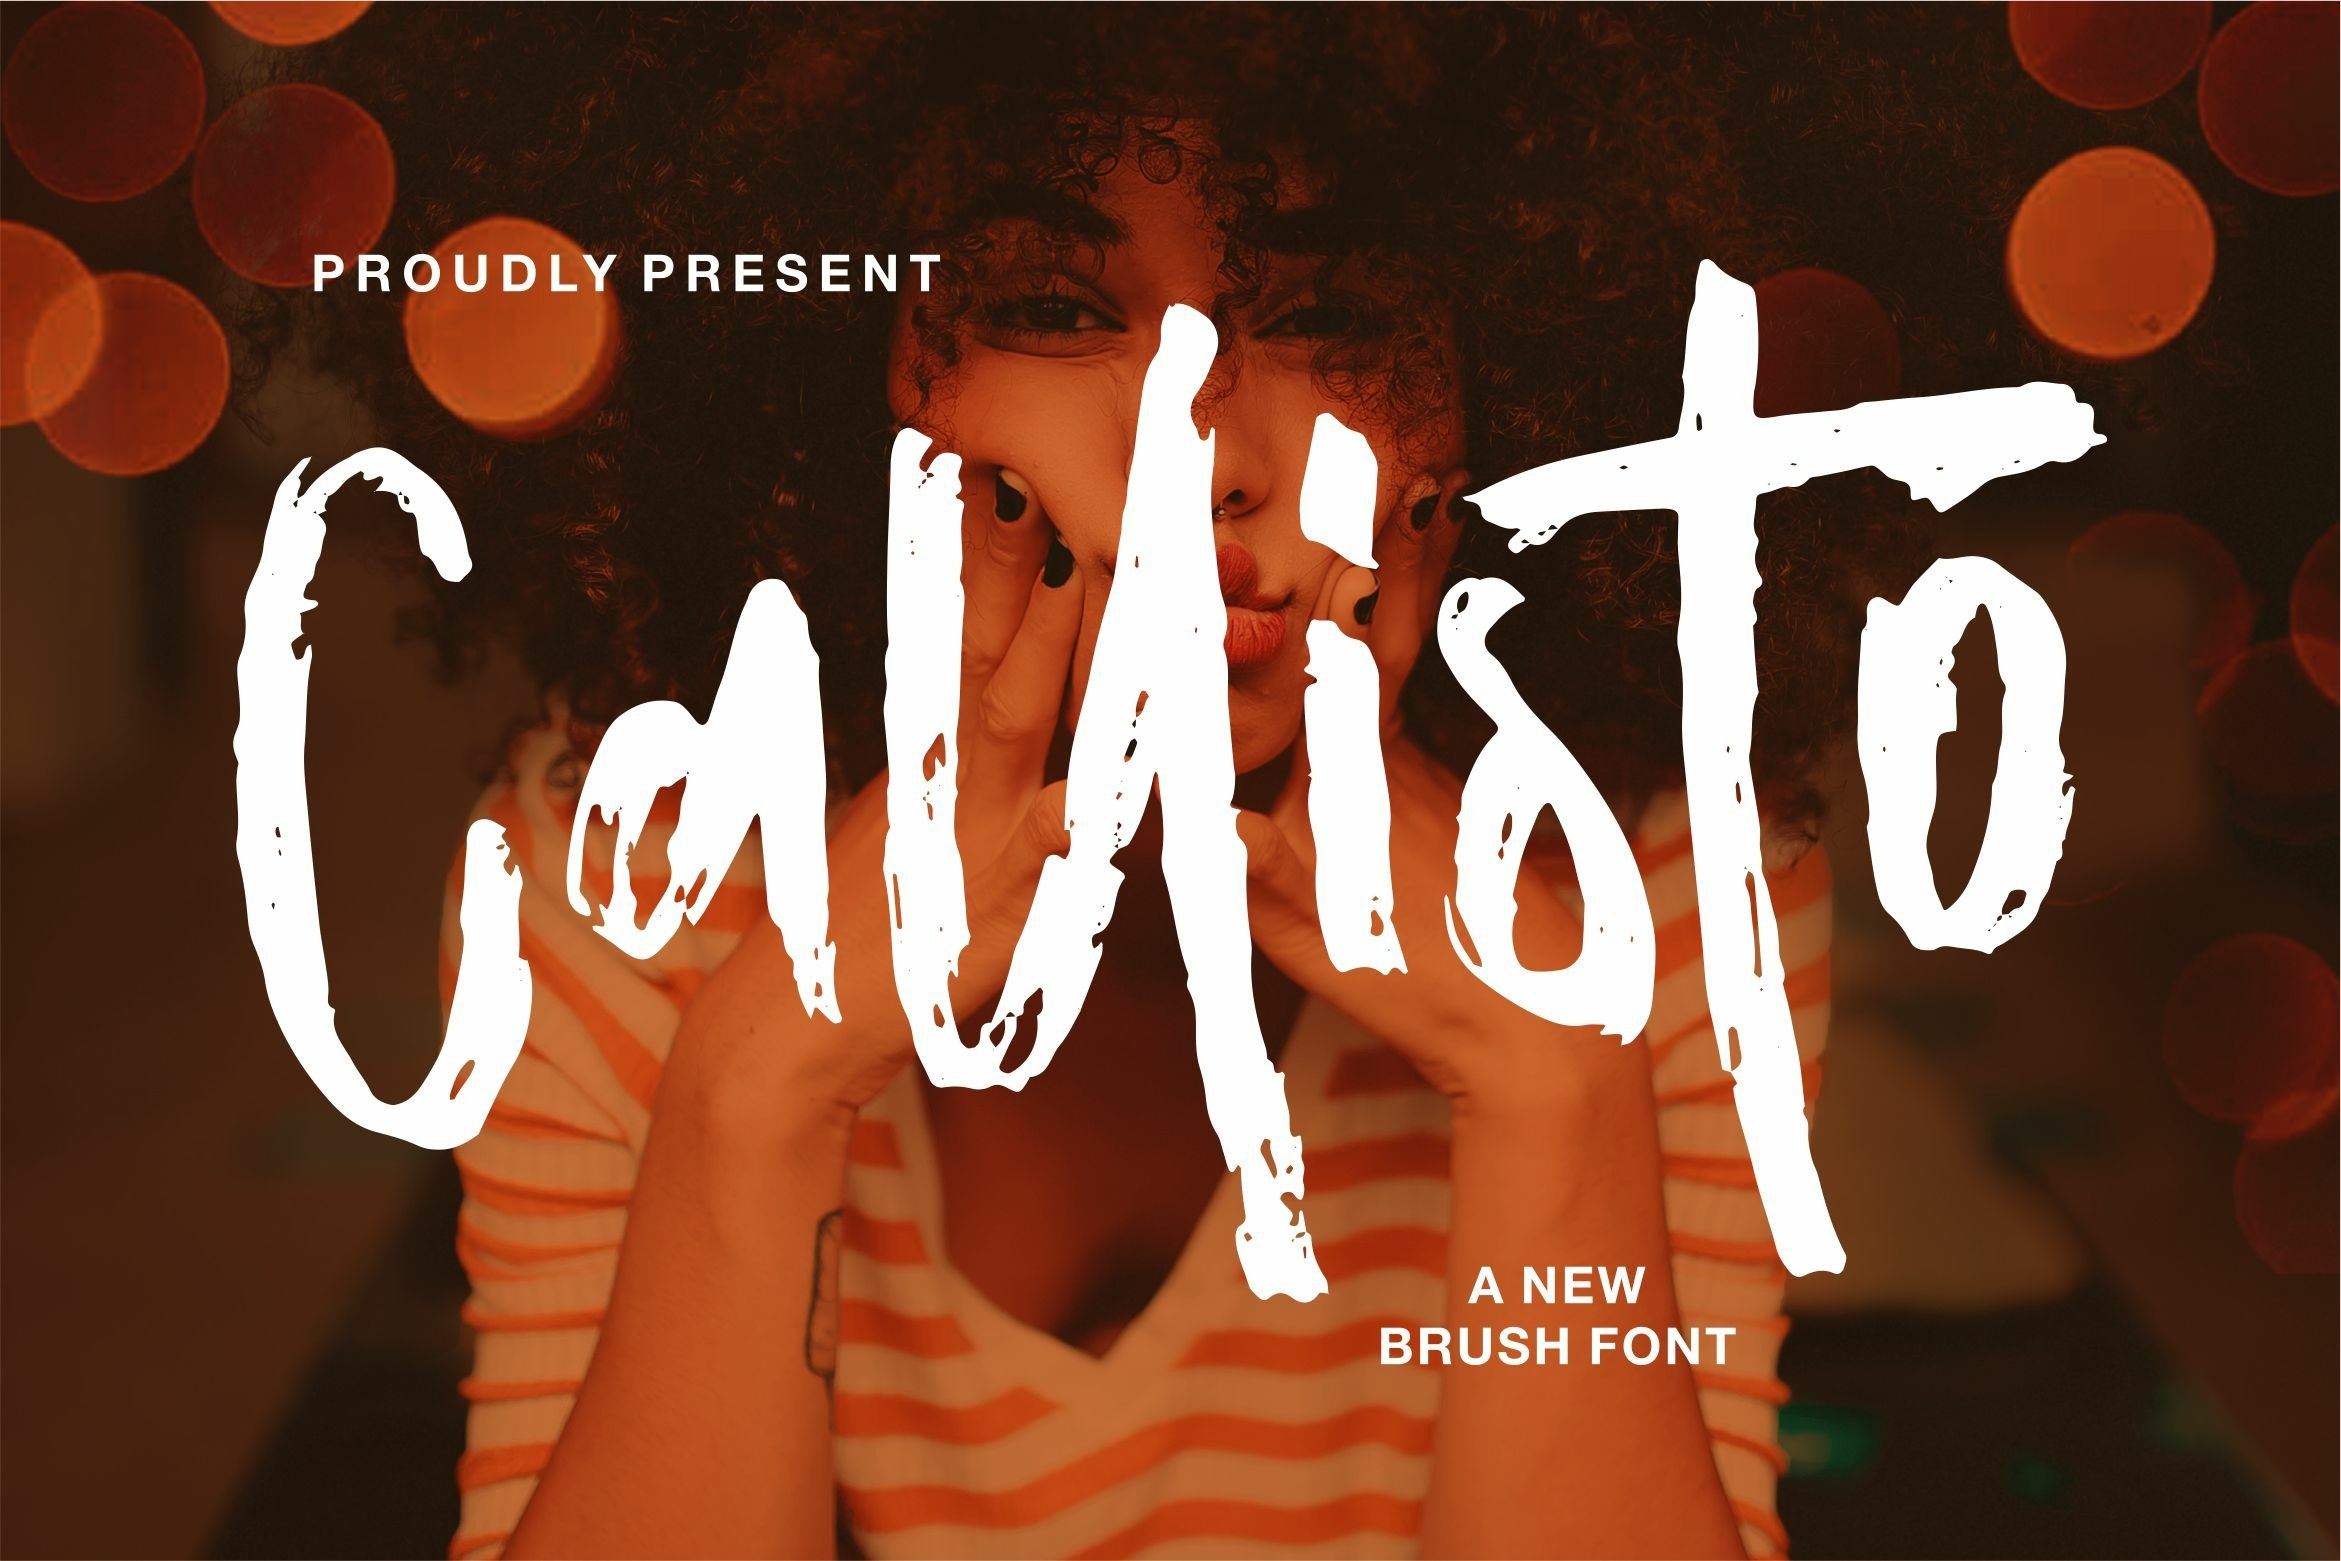 Callisto - A New Brush Font example image 1